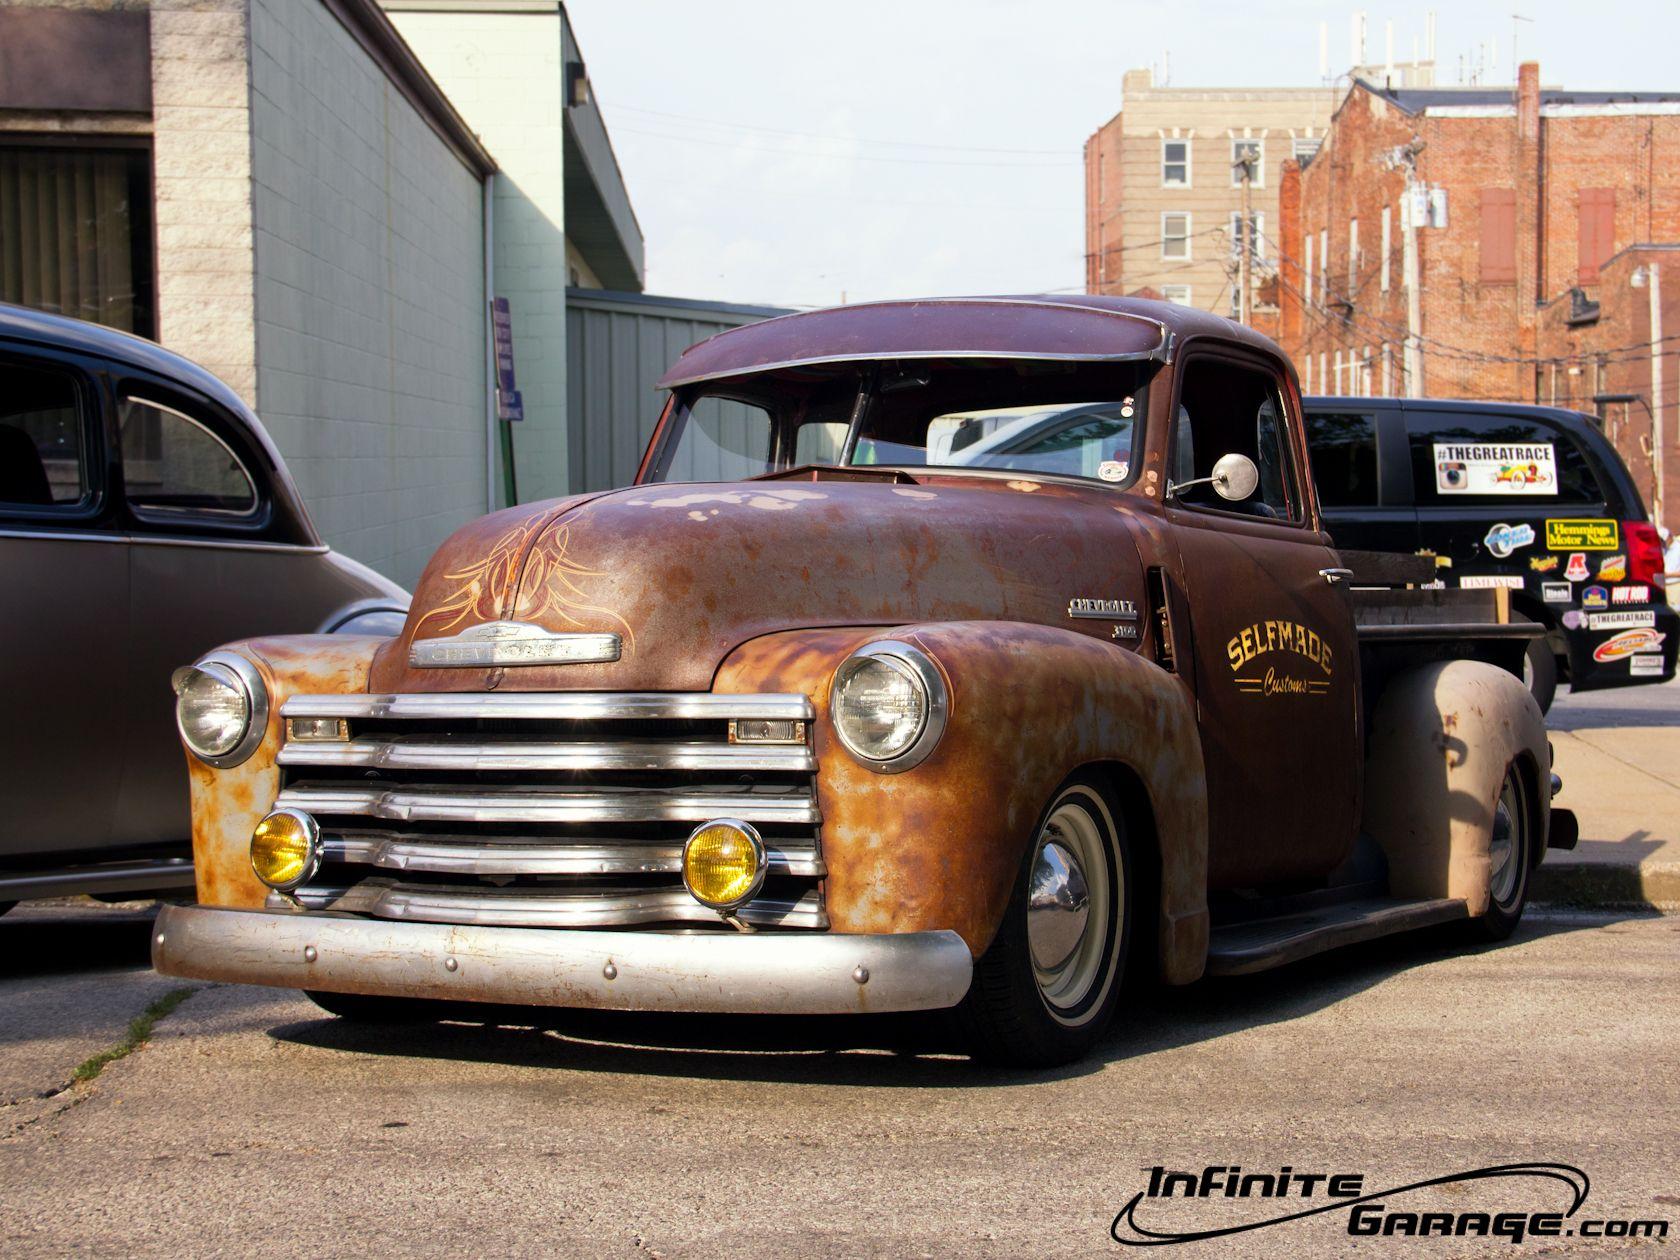 Chevy Rat Rod Truck Wallpaper Infinite Garage Rat Rod Cars Rat Rods Truck Rat Rod